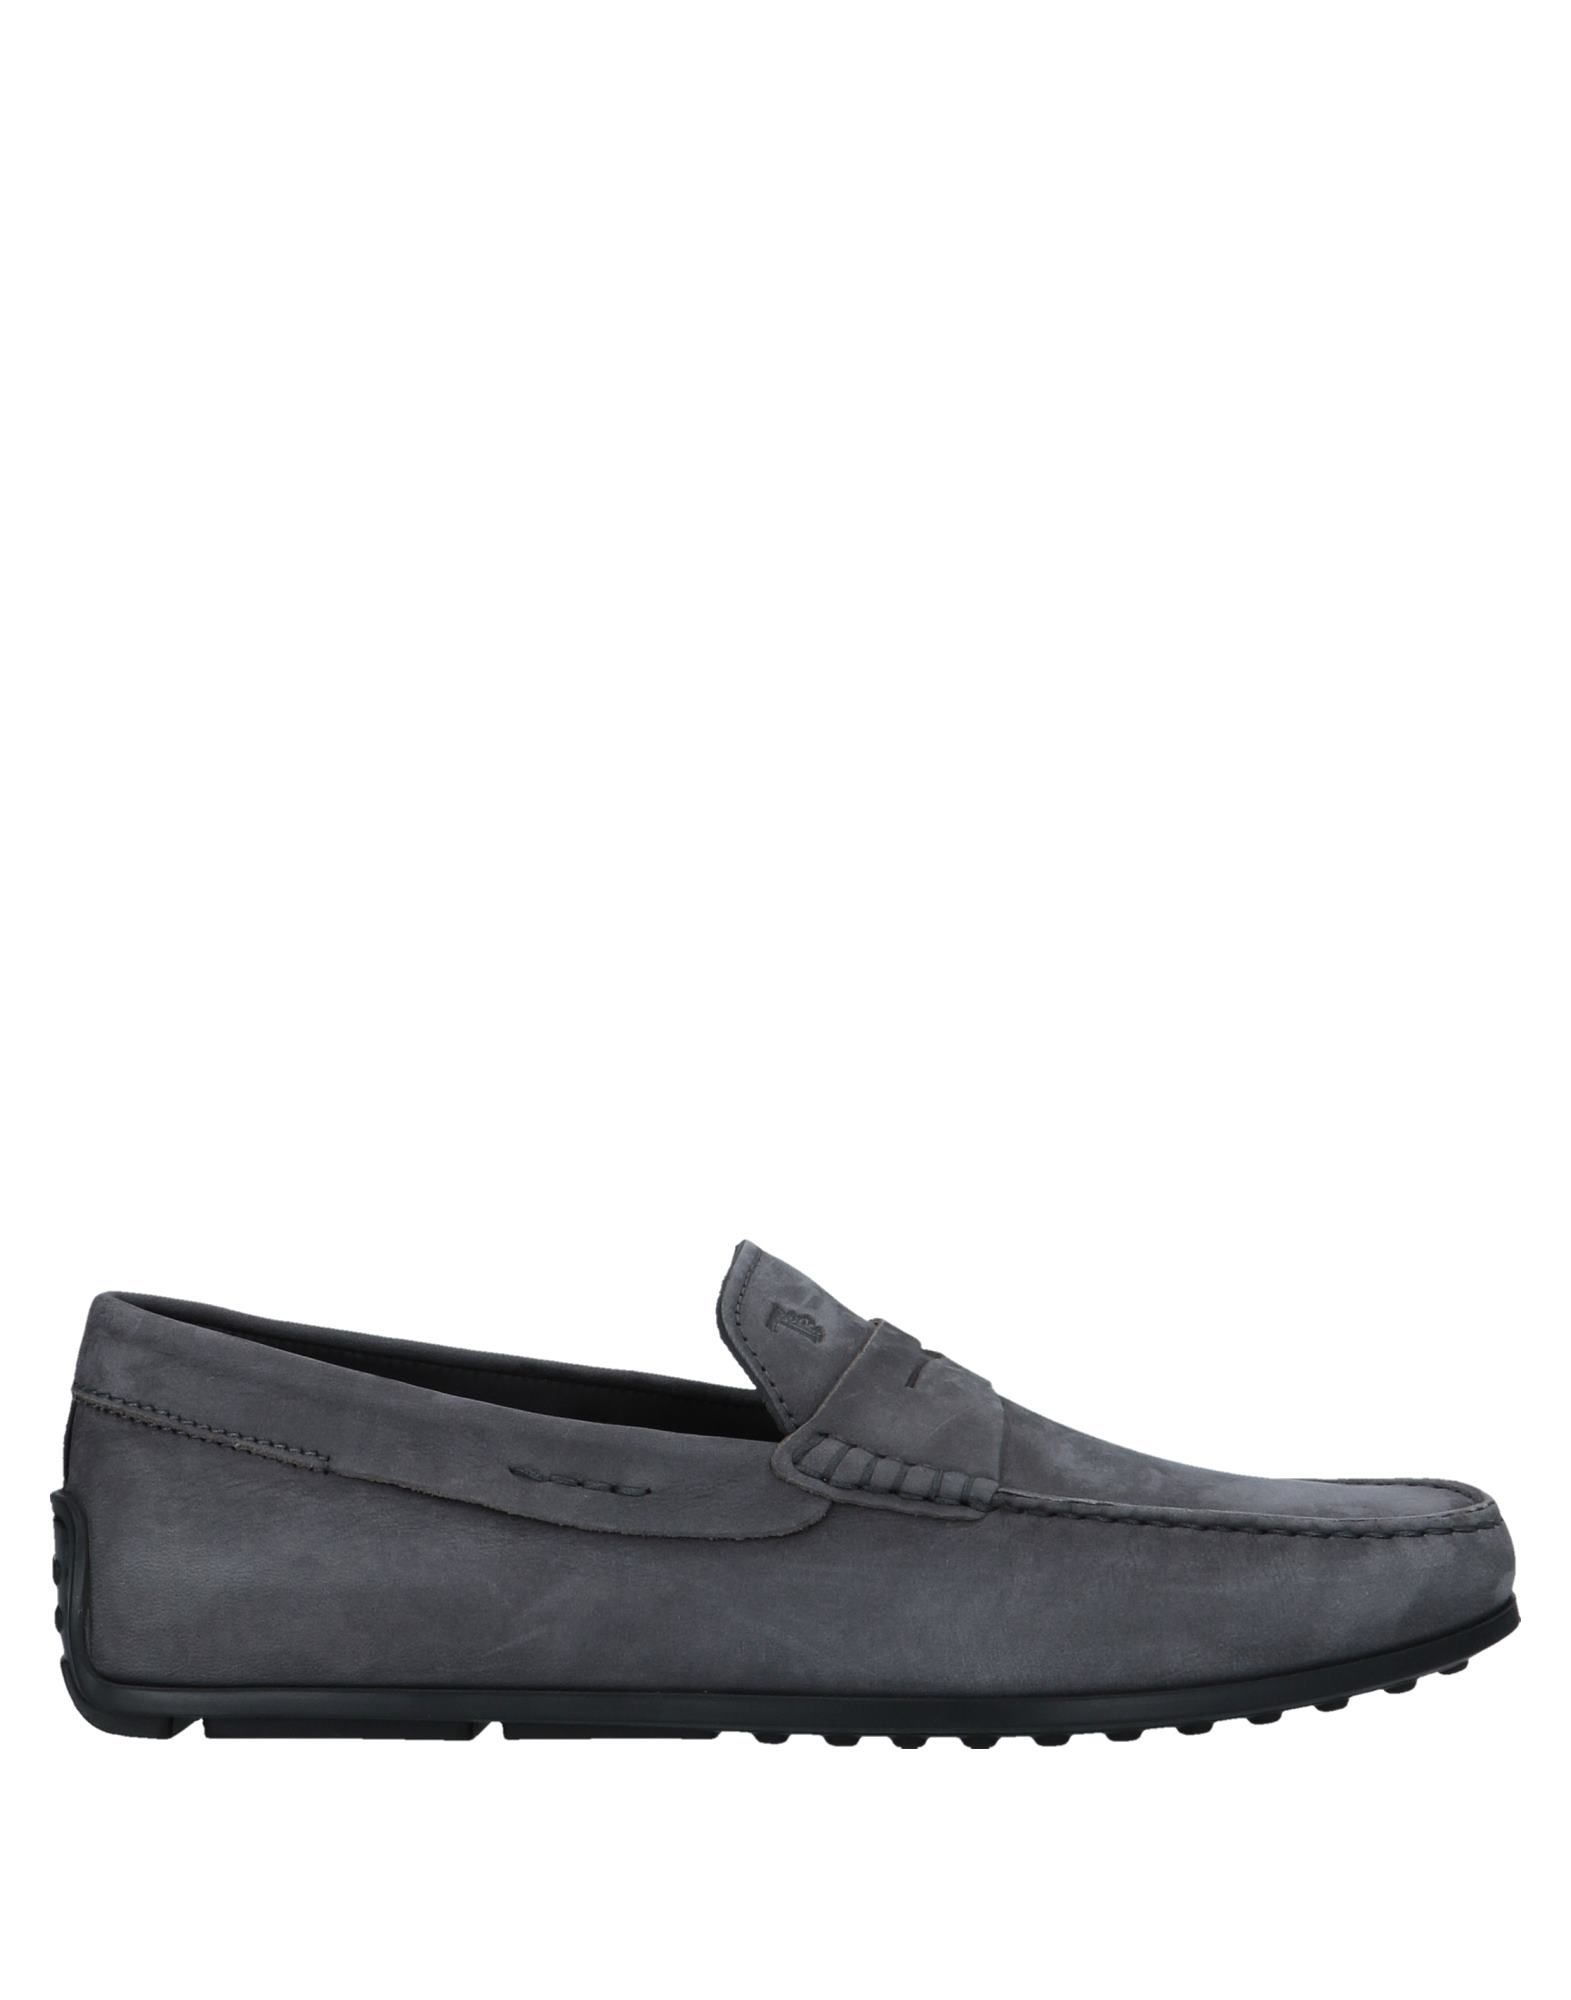 Tod's Mokassins Herren  11540700VF Gute Qualität beliebte Schuhe